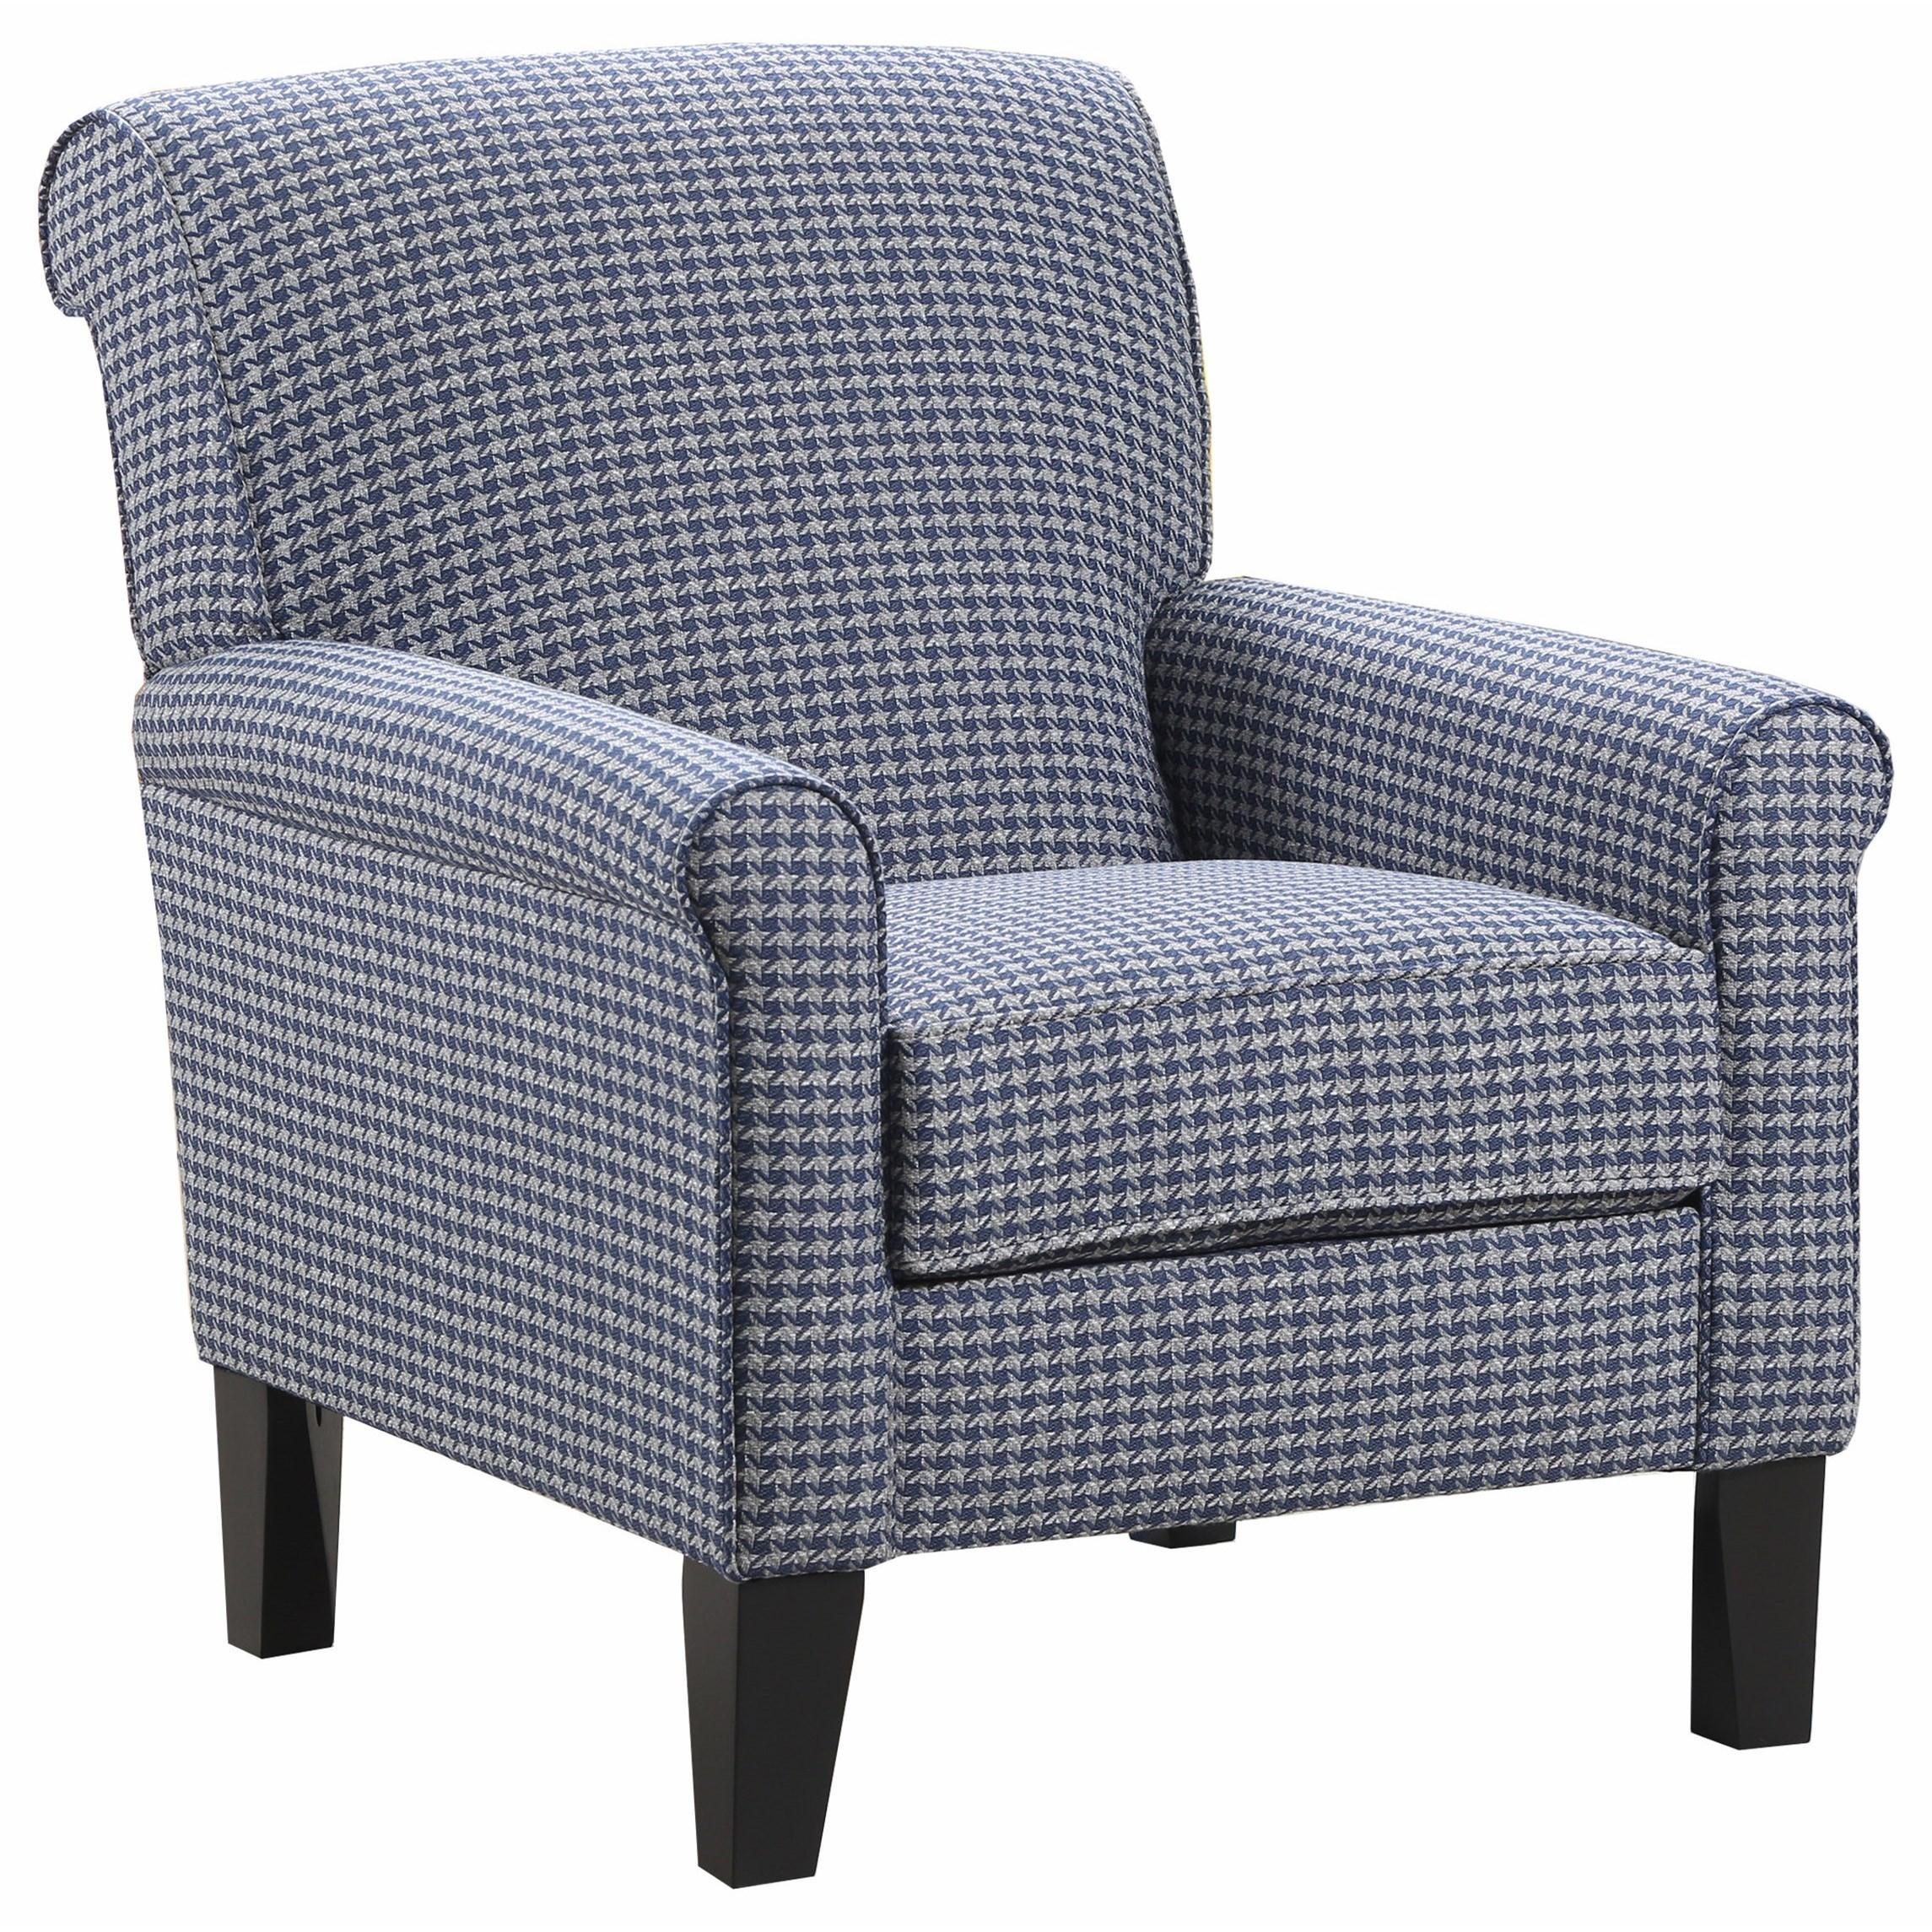 VFM Basics 2160 Accent Chair - Item Number: 2160Chair-Hawthorne Cobalt